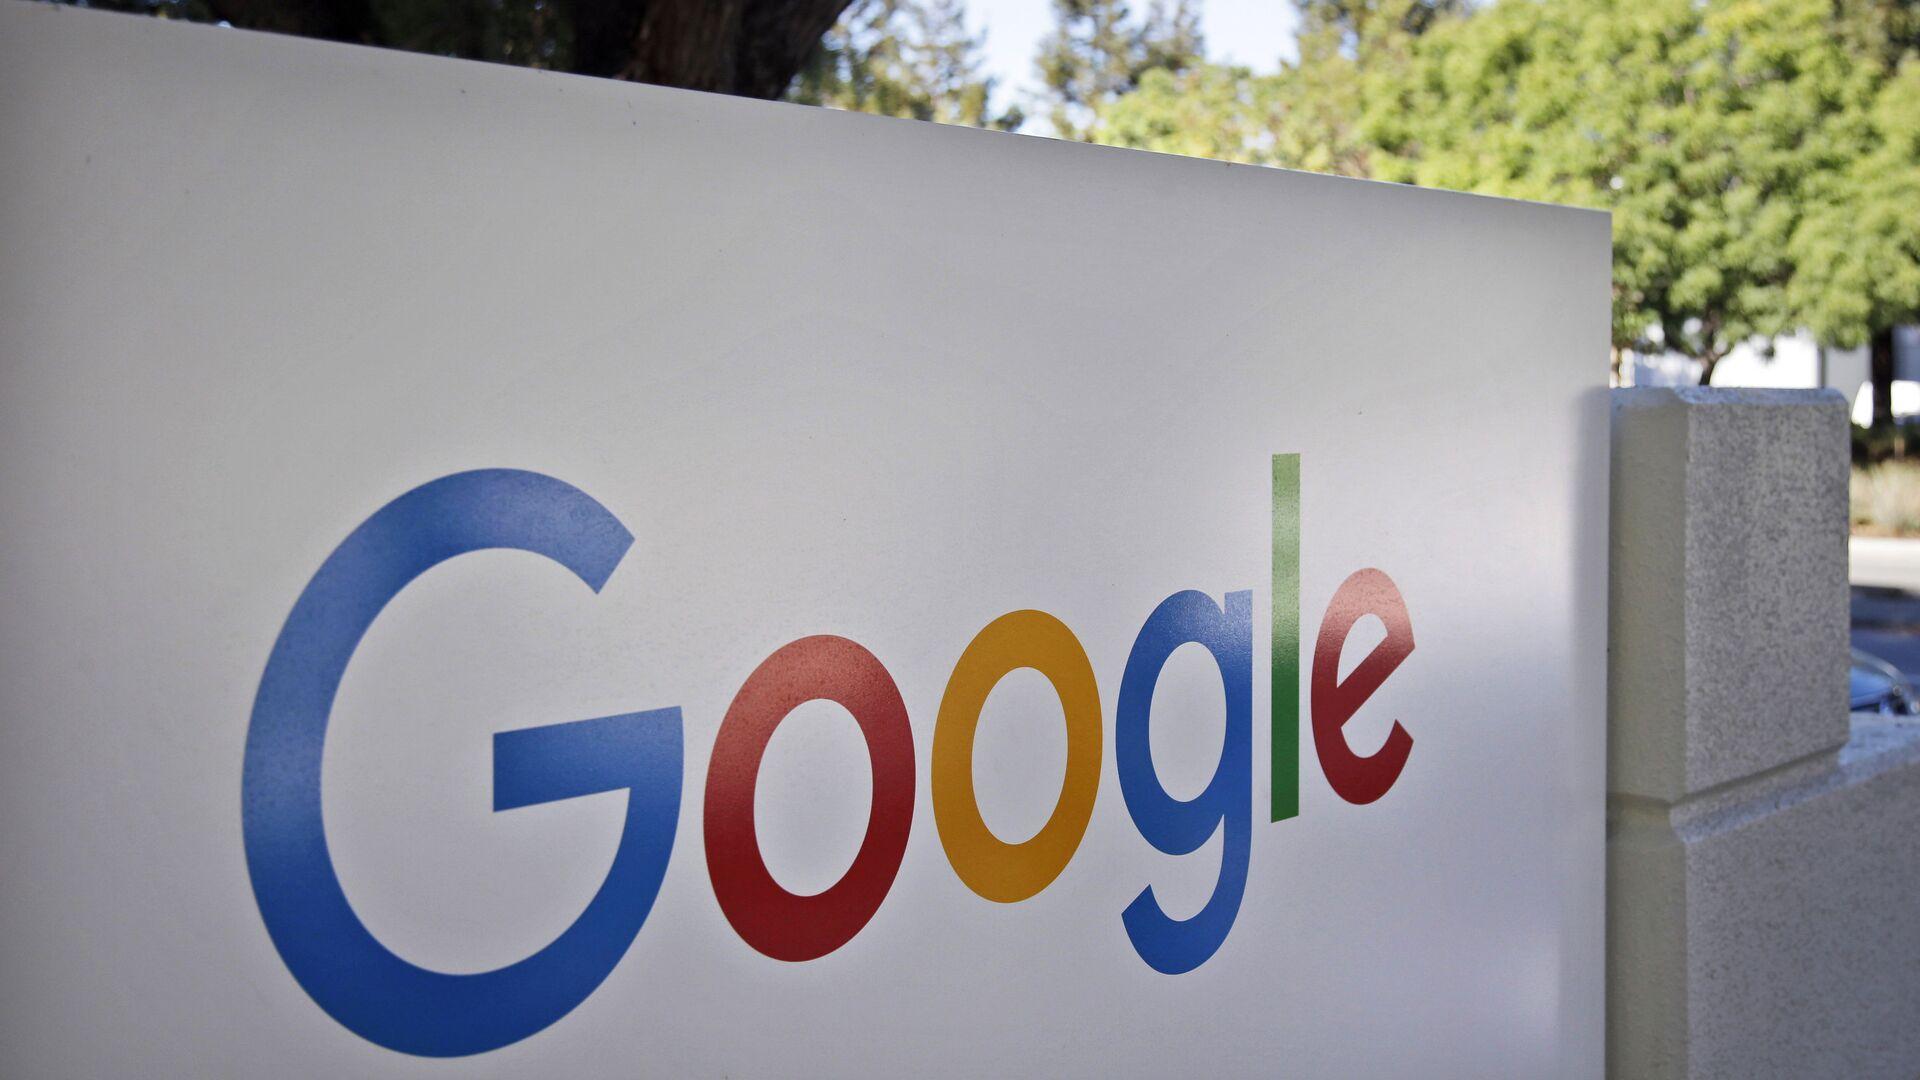 Штаб-квартира Google в Маунтин-Вью, штат Калифорния - РИА Новости, 1920, 24.06.2021